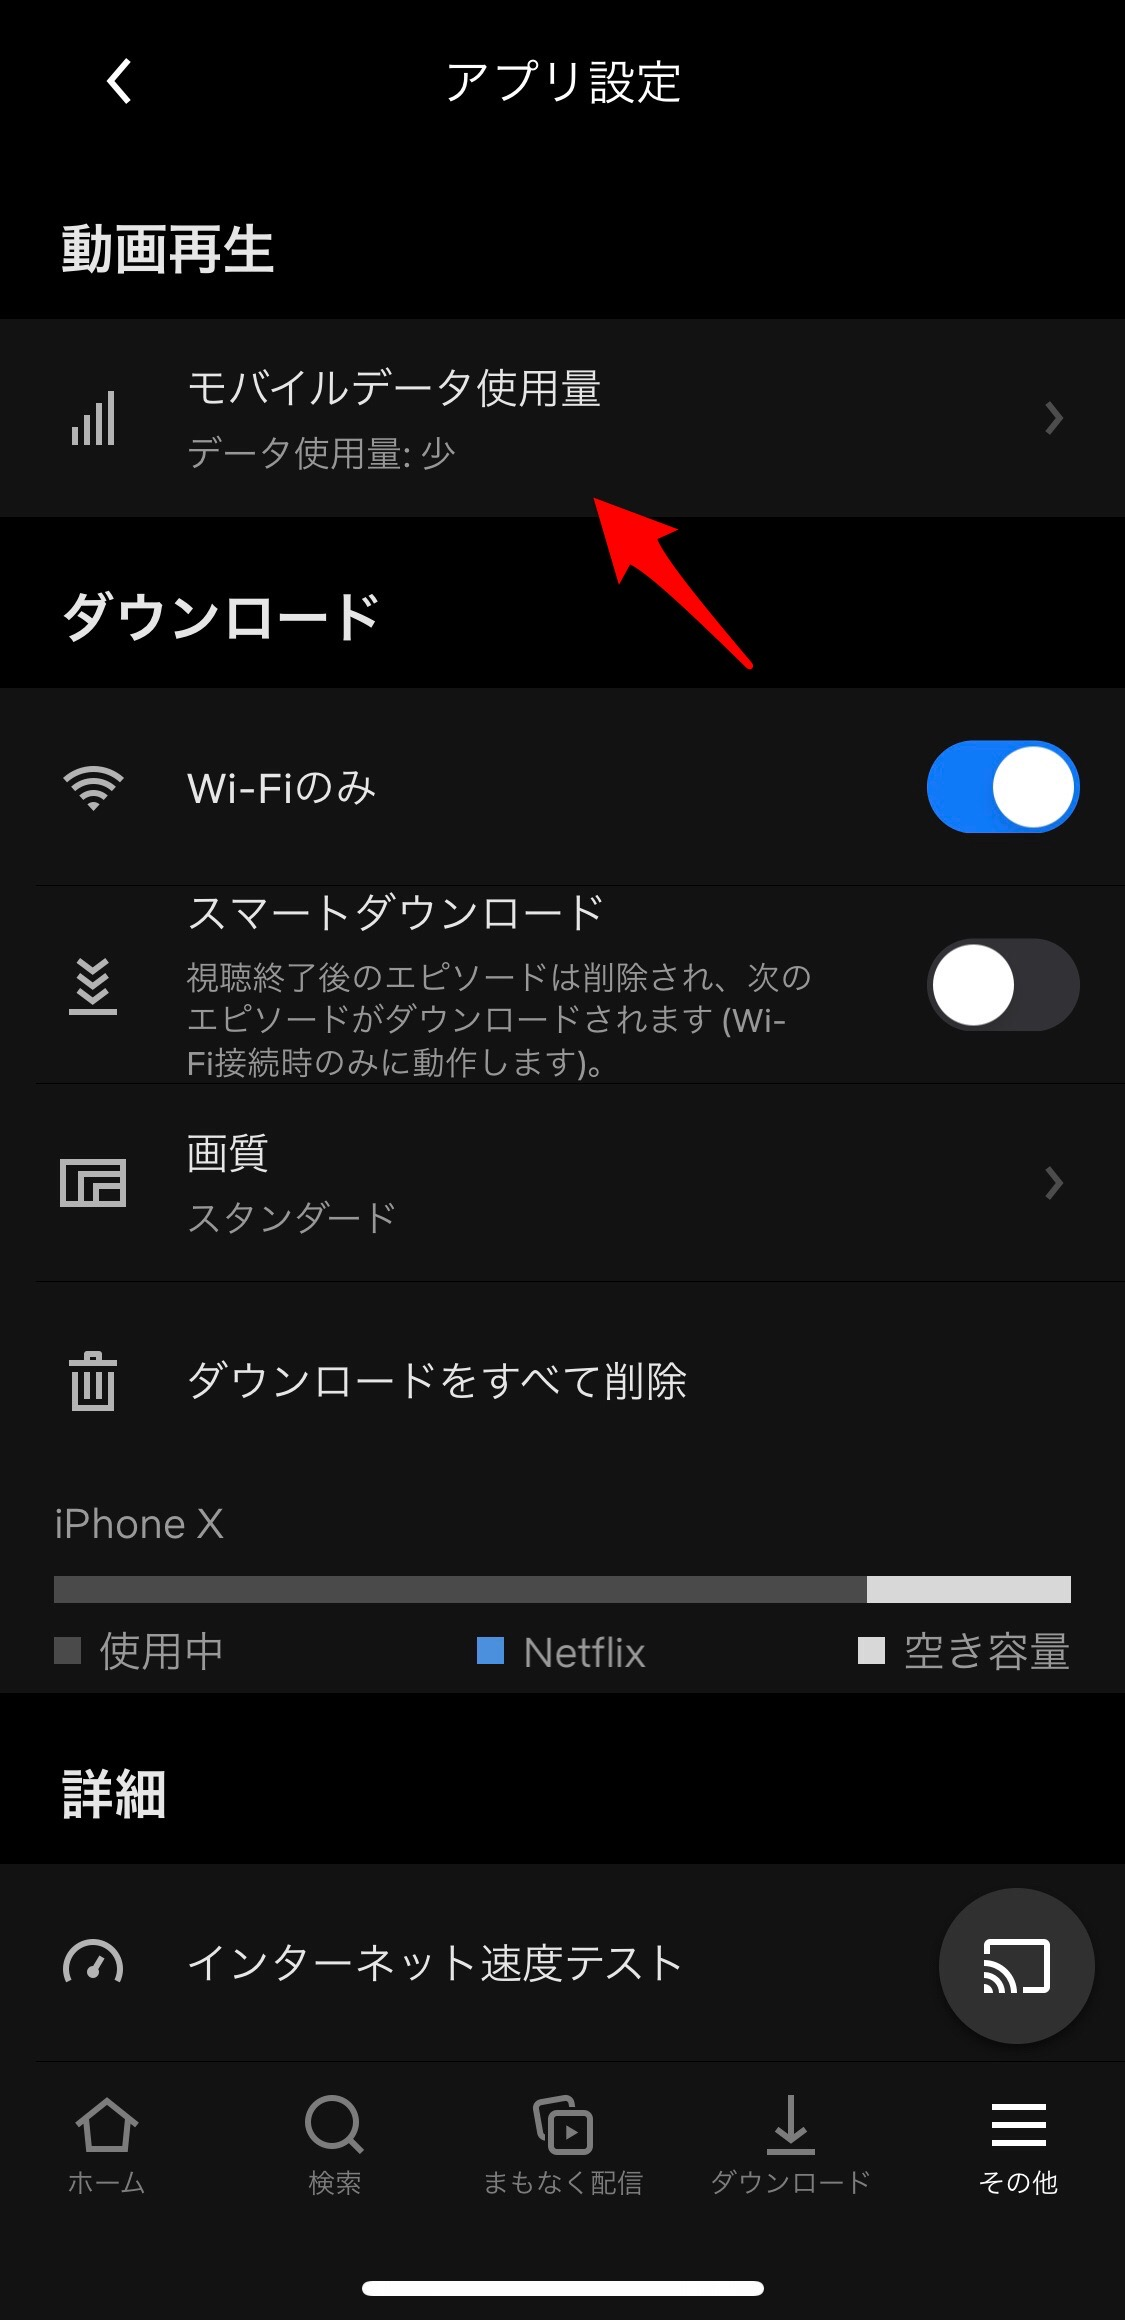 Netflix モバイルデータ使用量